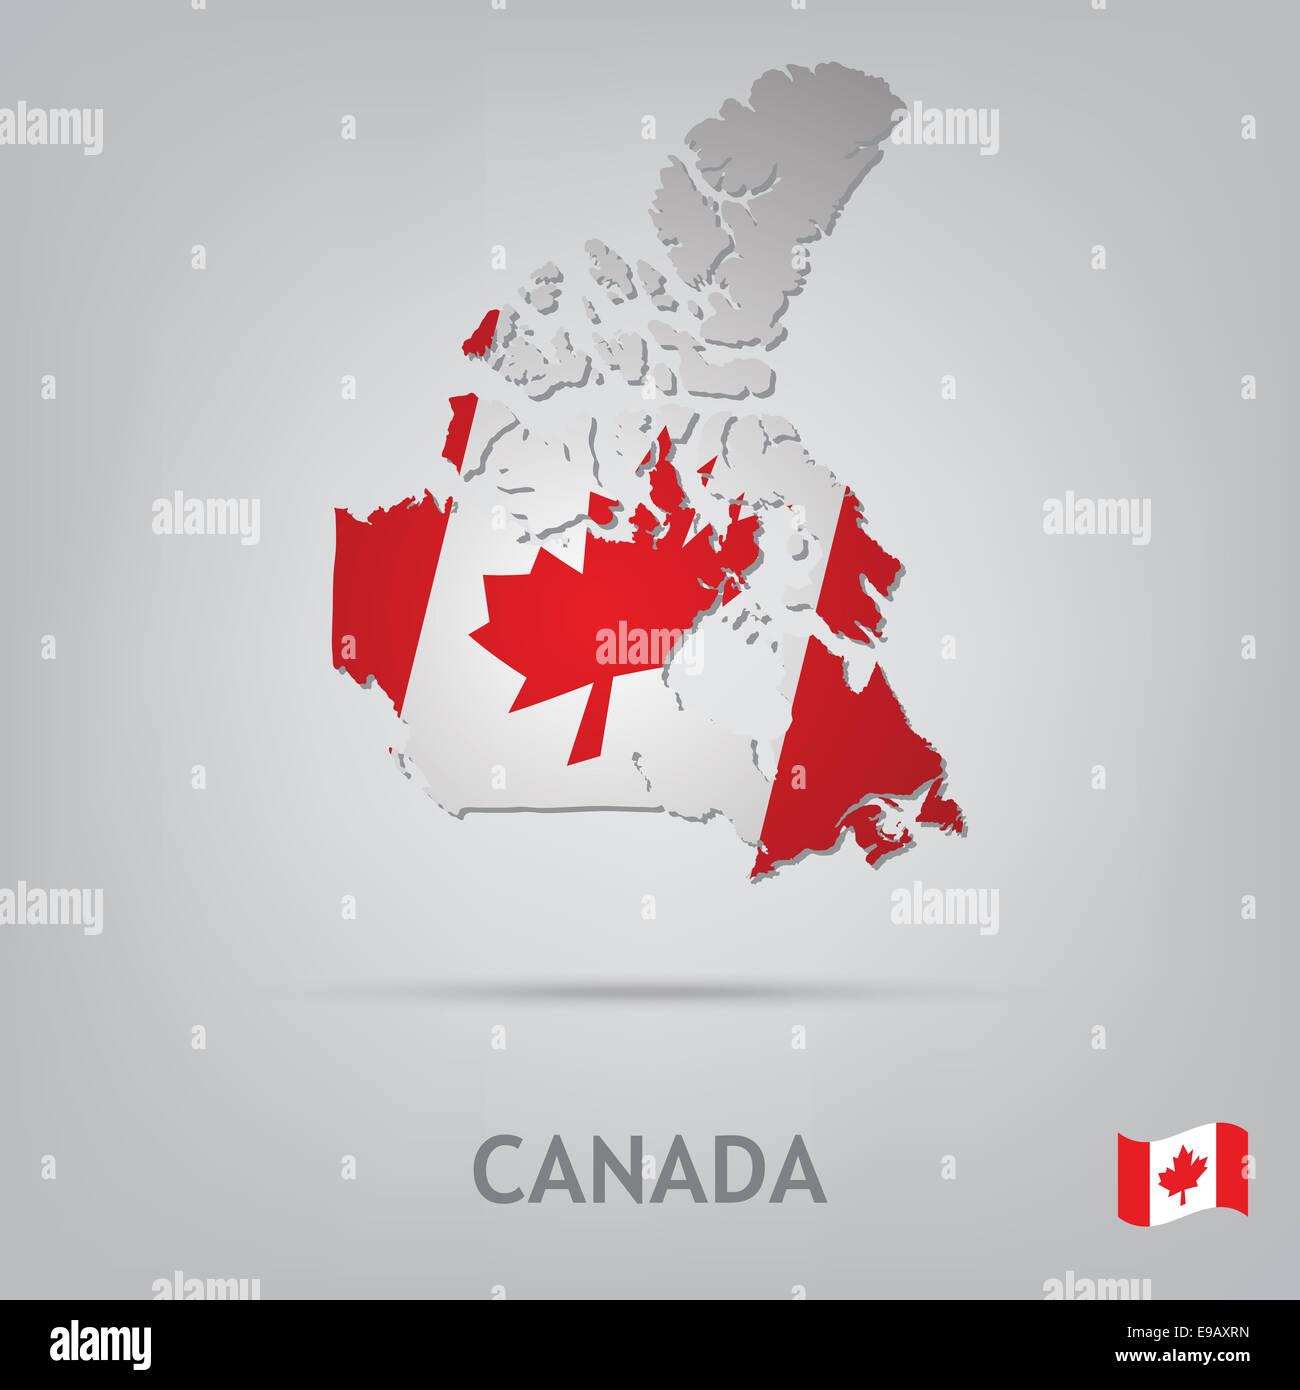 canada - Stock Image